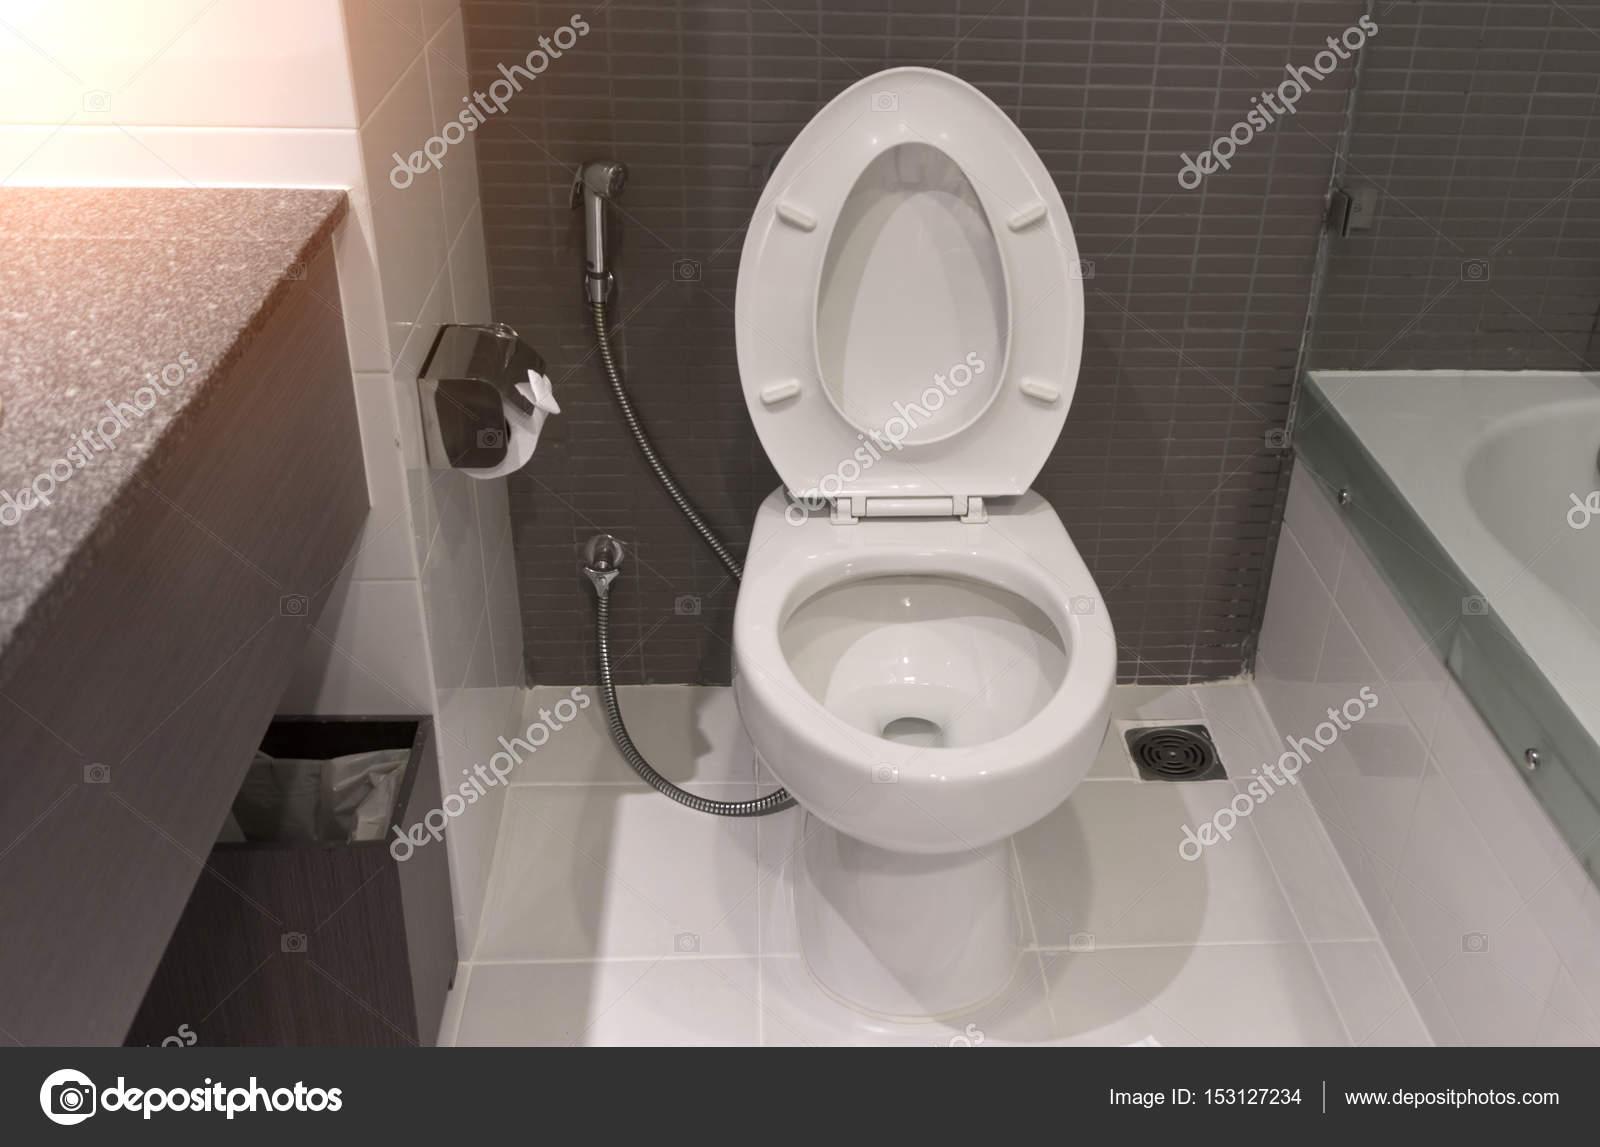 Moderne WC Schüssel Design im Bad — Stockfoto © pkproject #153127234